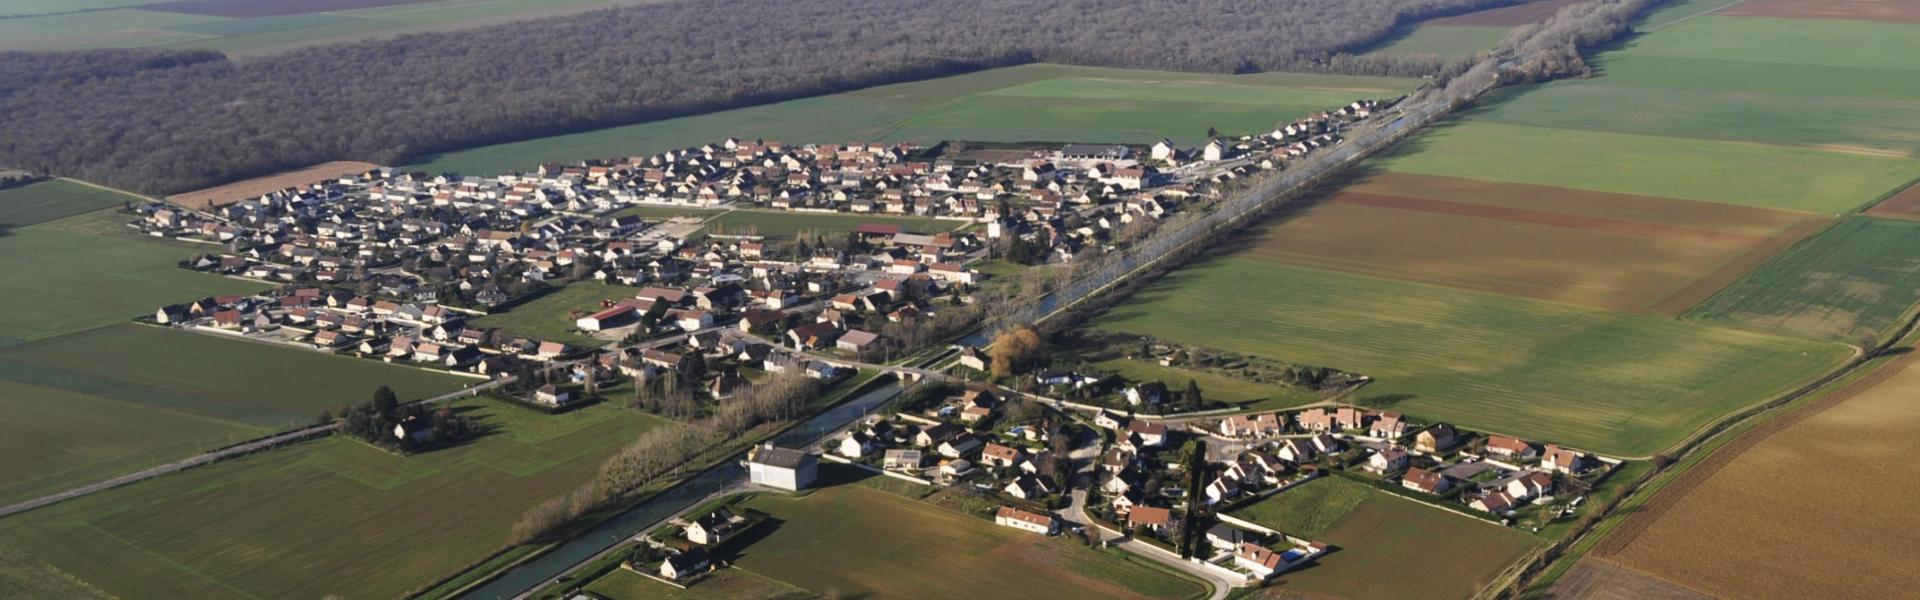 Histoire du village